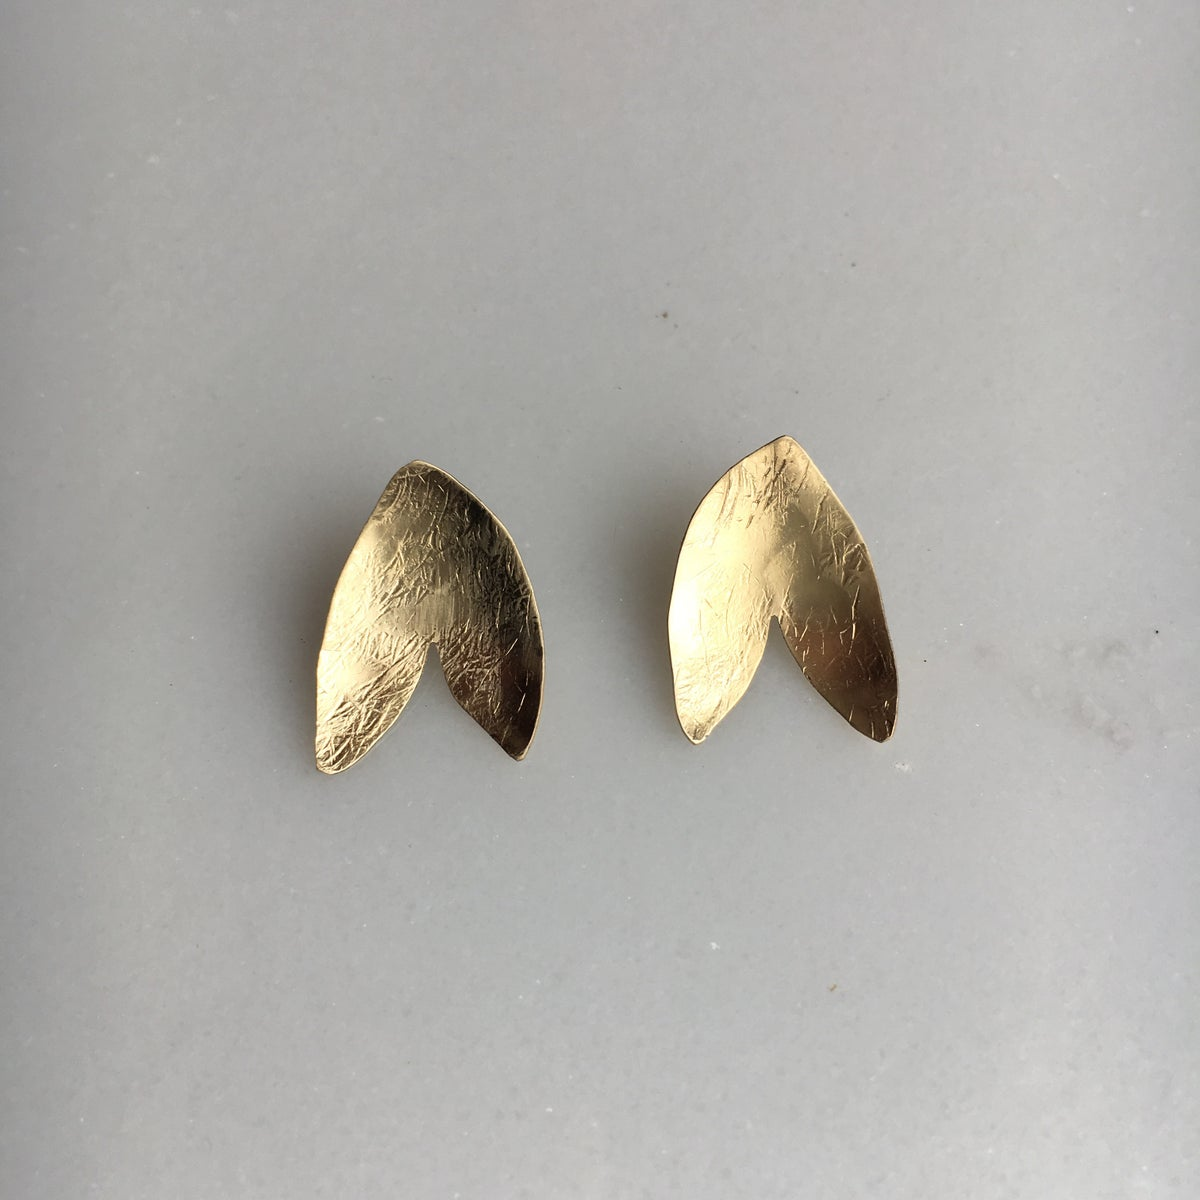 Image of meadow earring